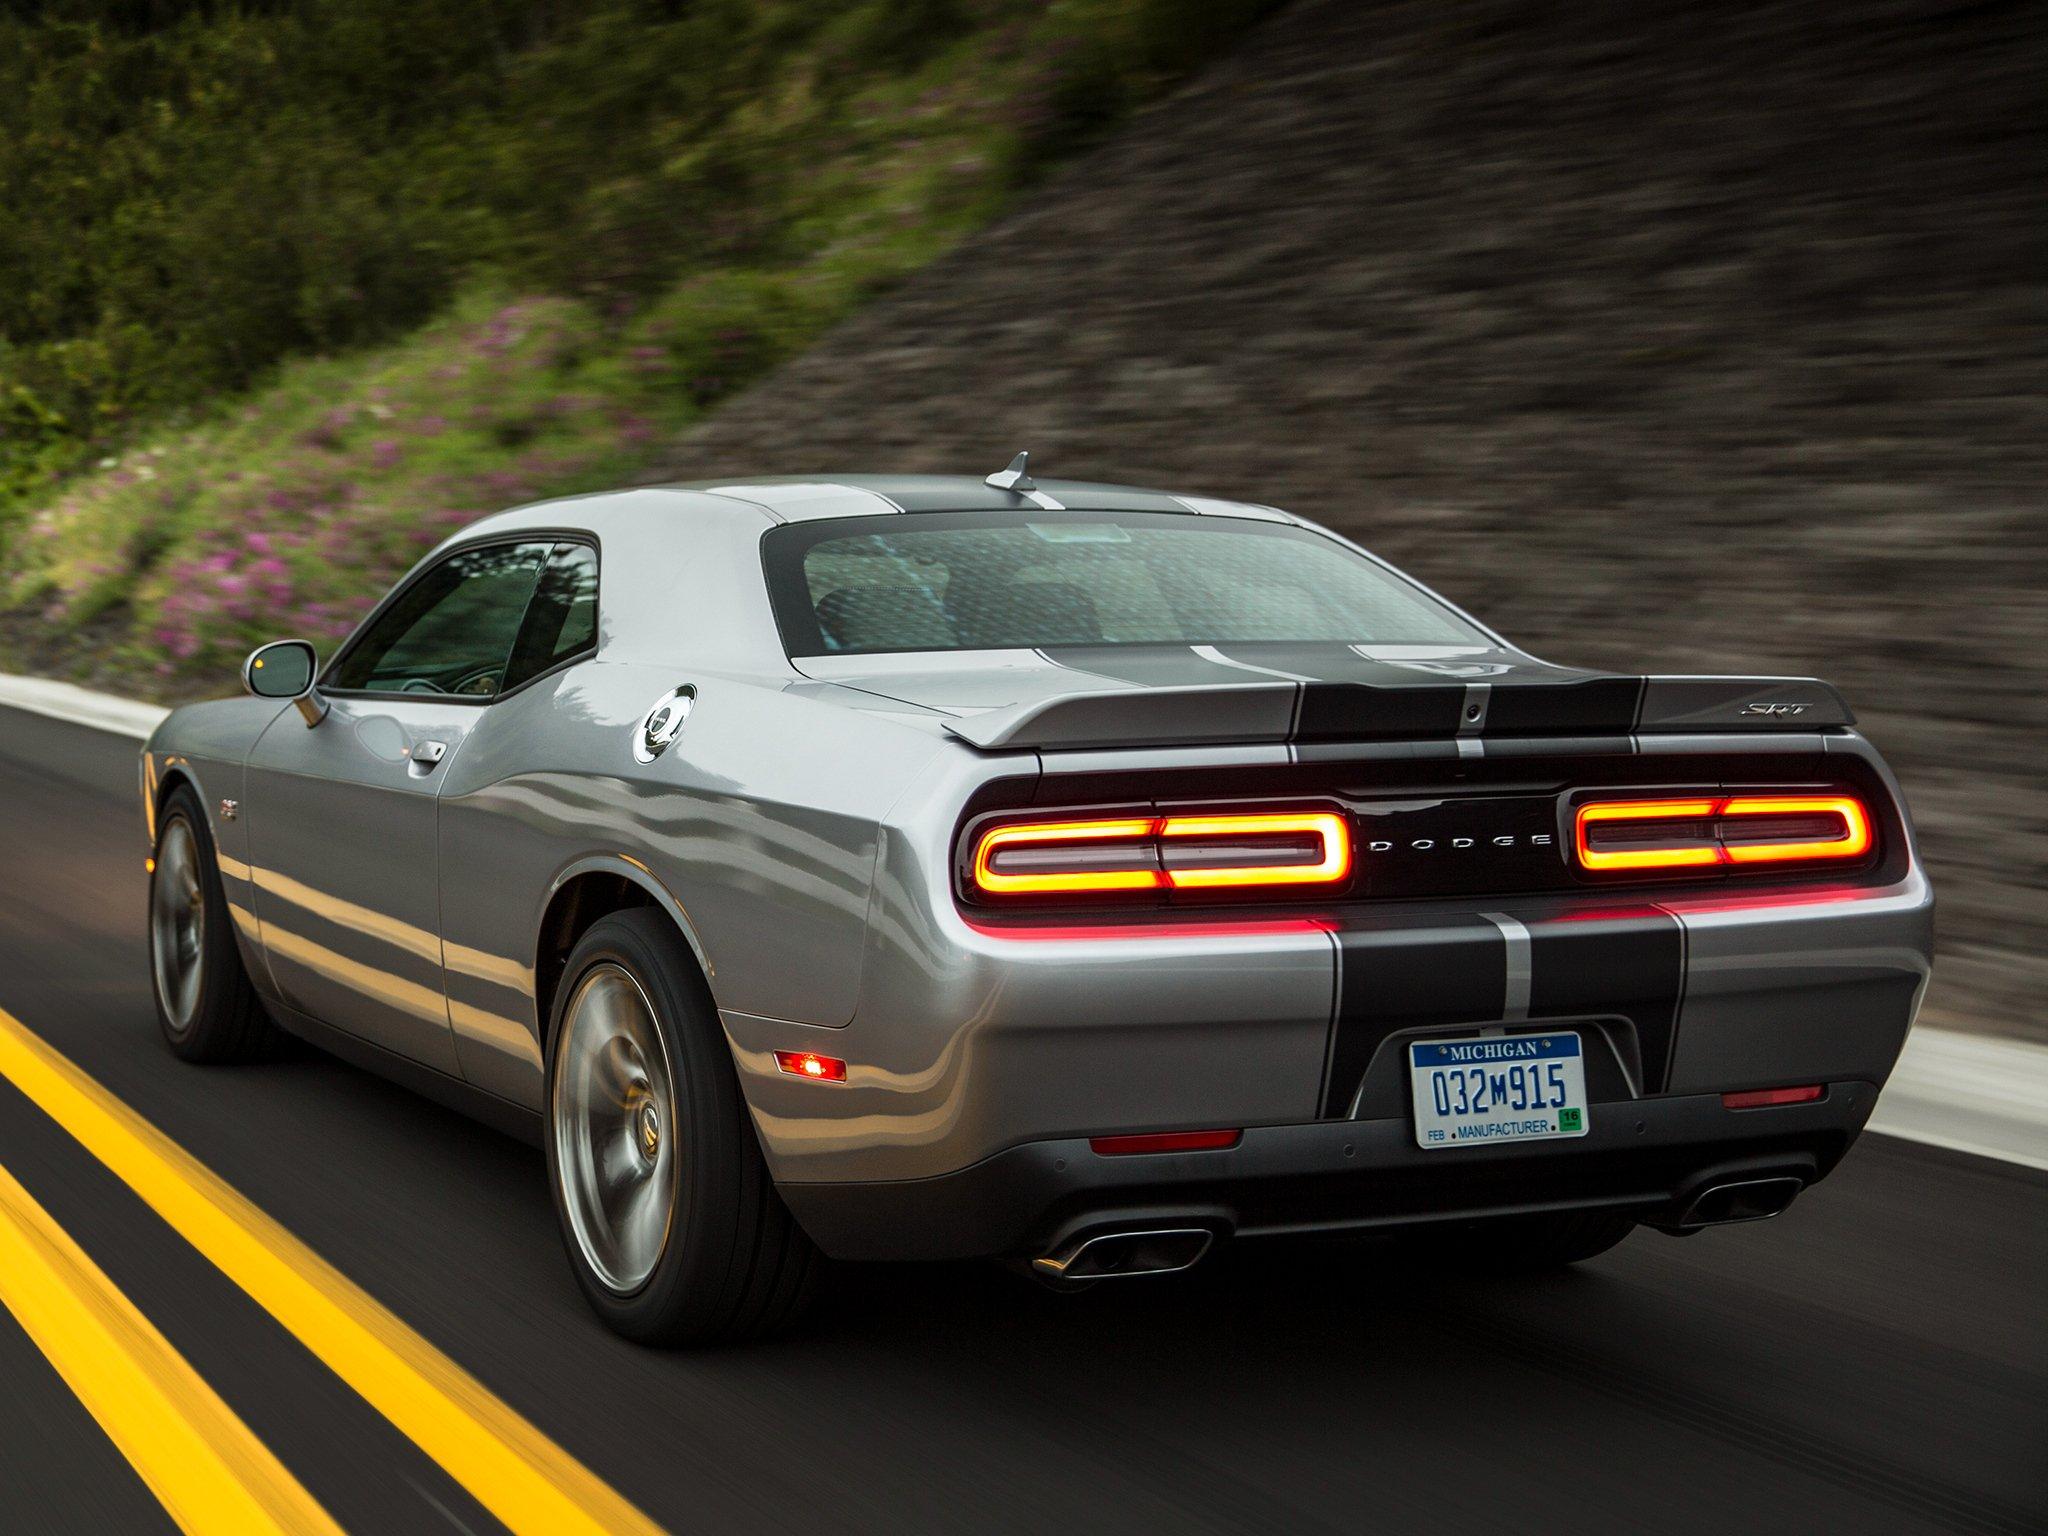 2015, Dodge, Challenger, Srt, 392, l c , Muscle Wallpapers